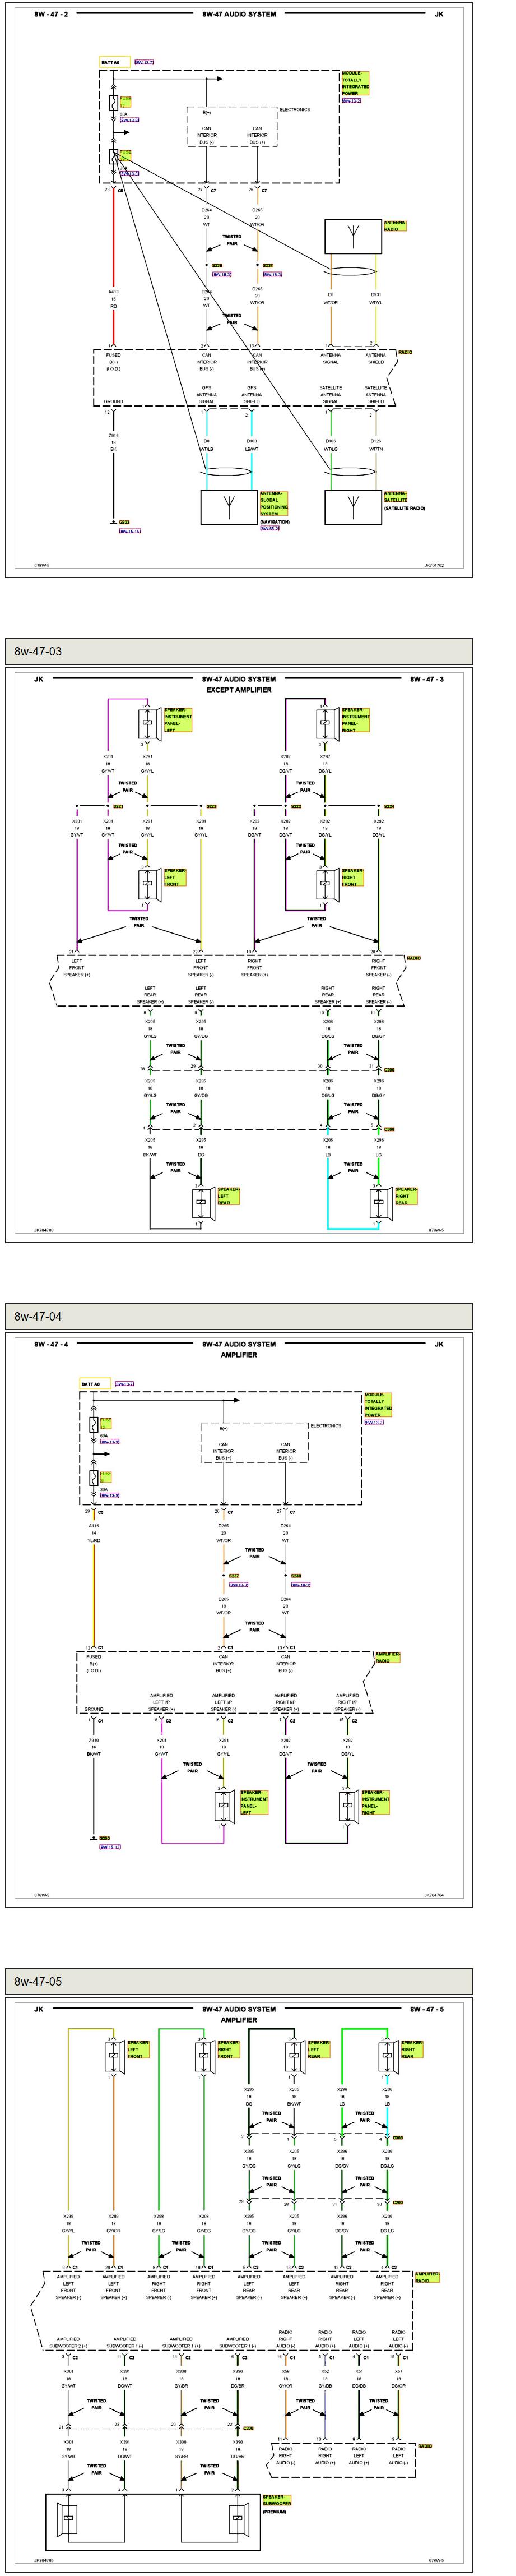 Need Wiring Diagram For Part No P05107095aj Thats The Chrysler Kenwood Model Kdc X494 03d29b87 0754 4d51 8d8c 03d29b8